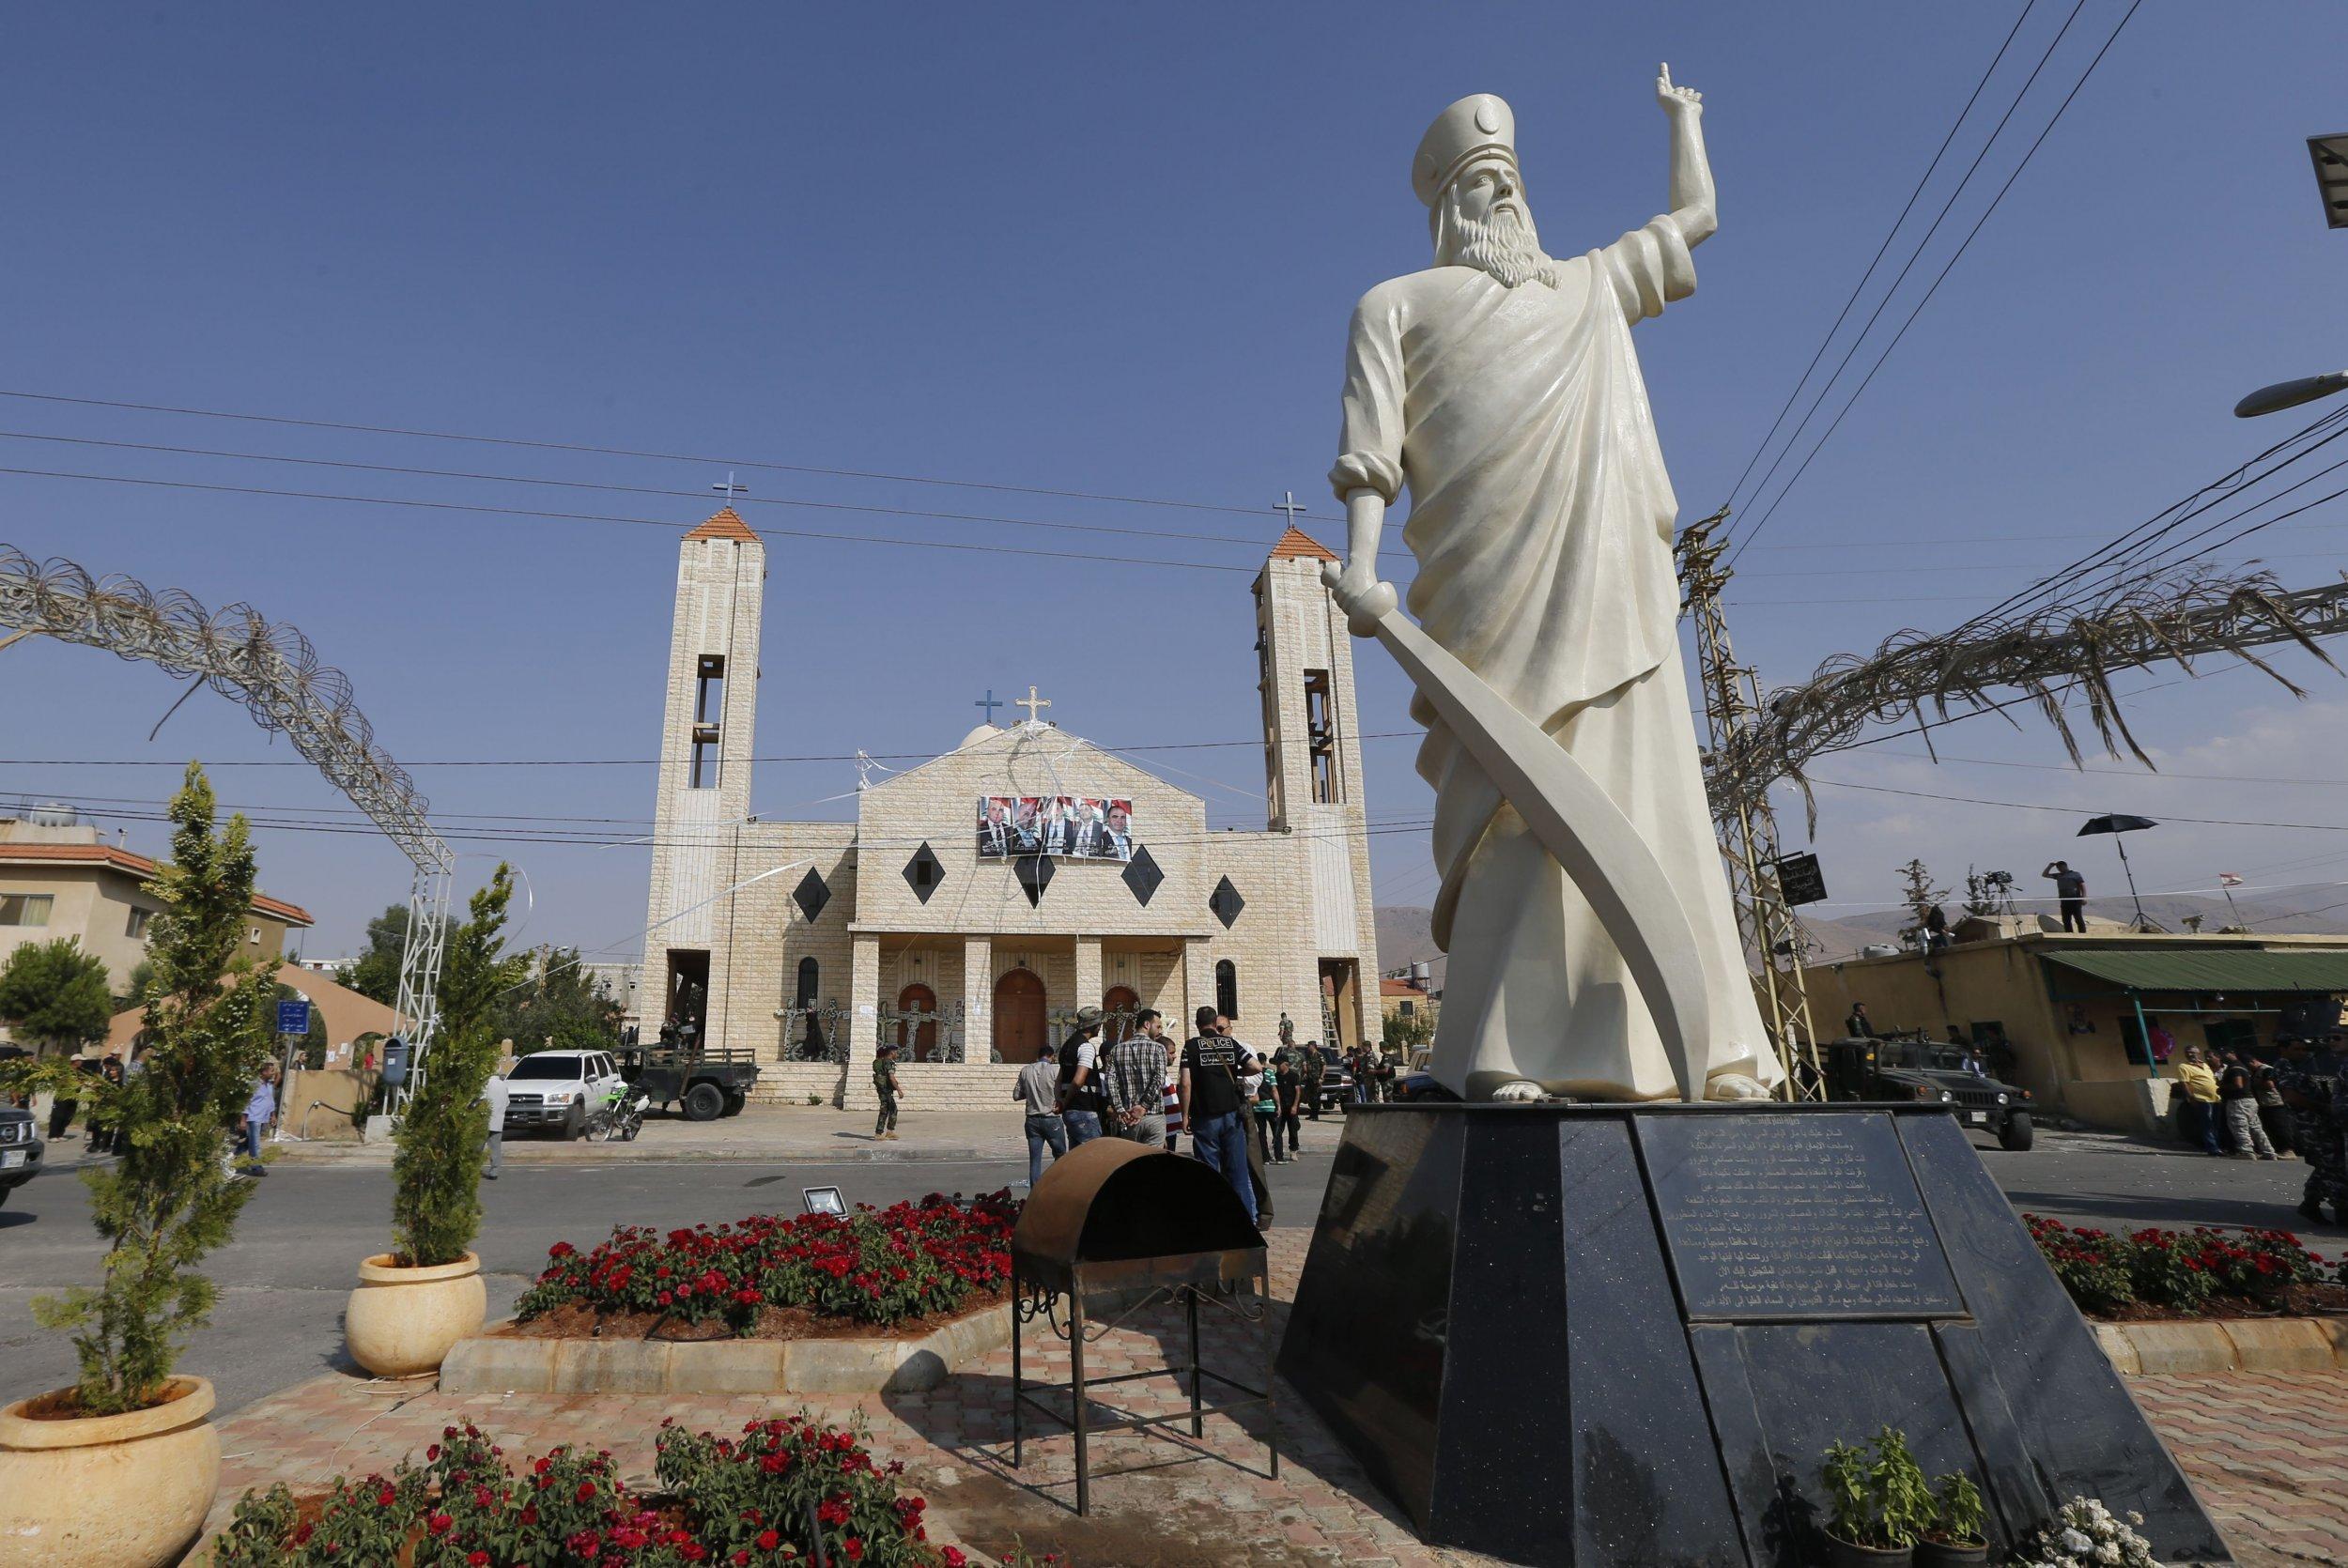 The town of Qaa